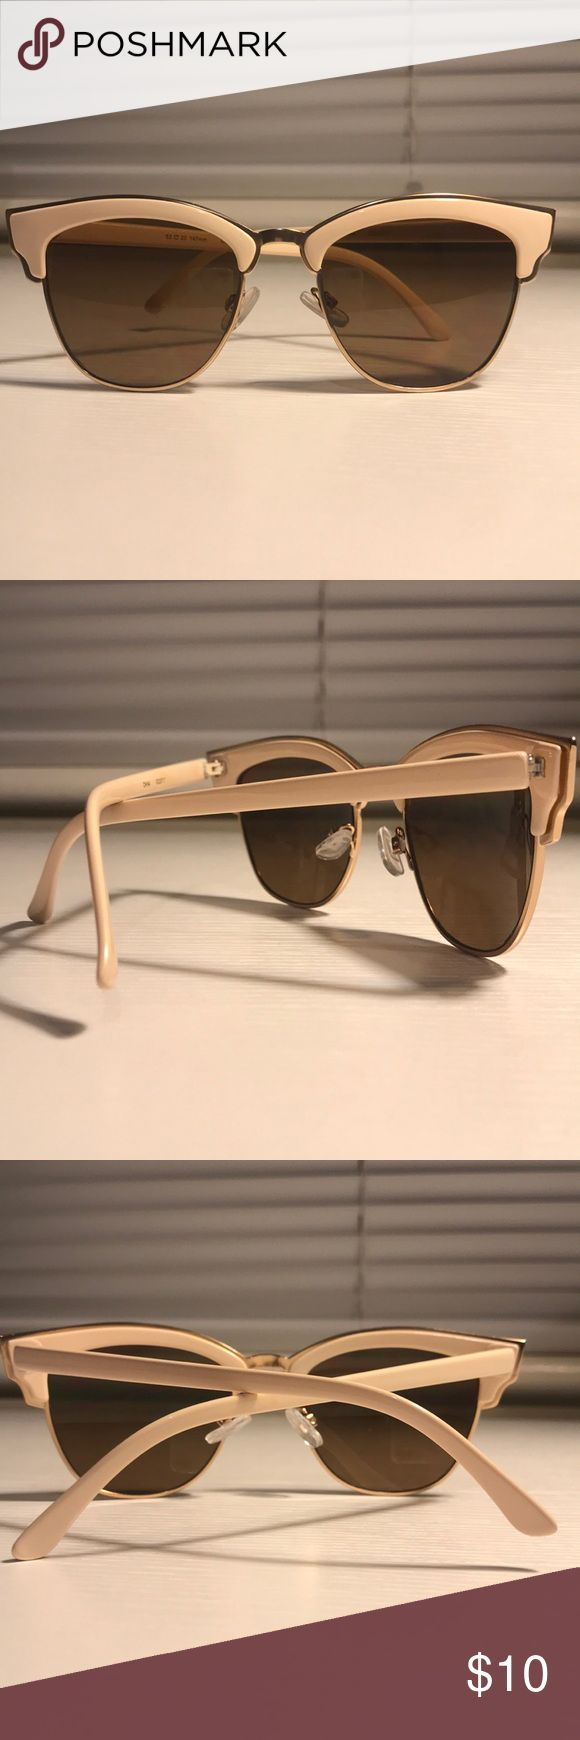 Very Light Pink/Ivory Cateye Sunglasses Very light pink, more ivory colored, Cateye sunglasses. Accessories Sunglasses